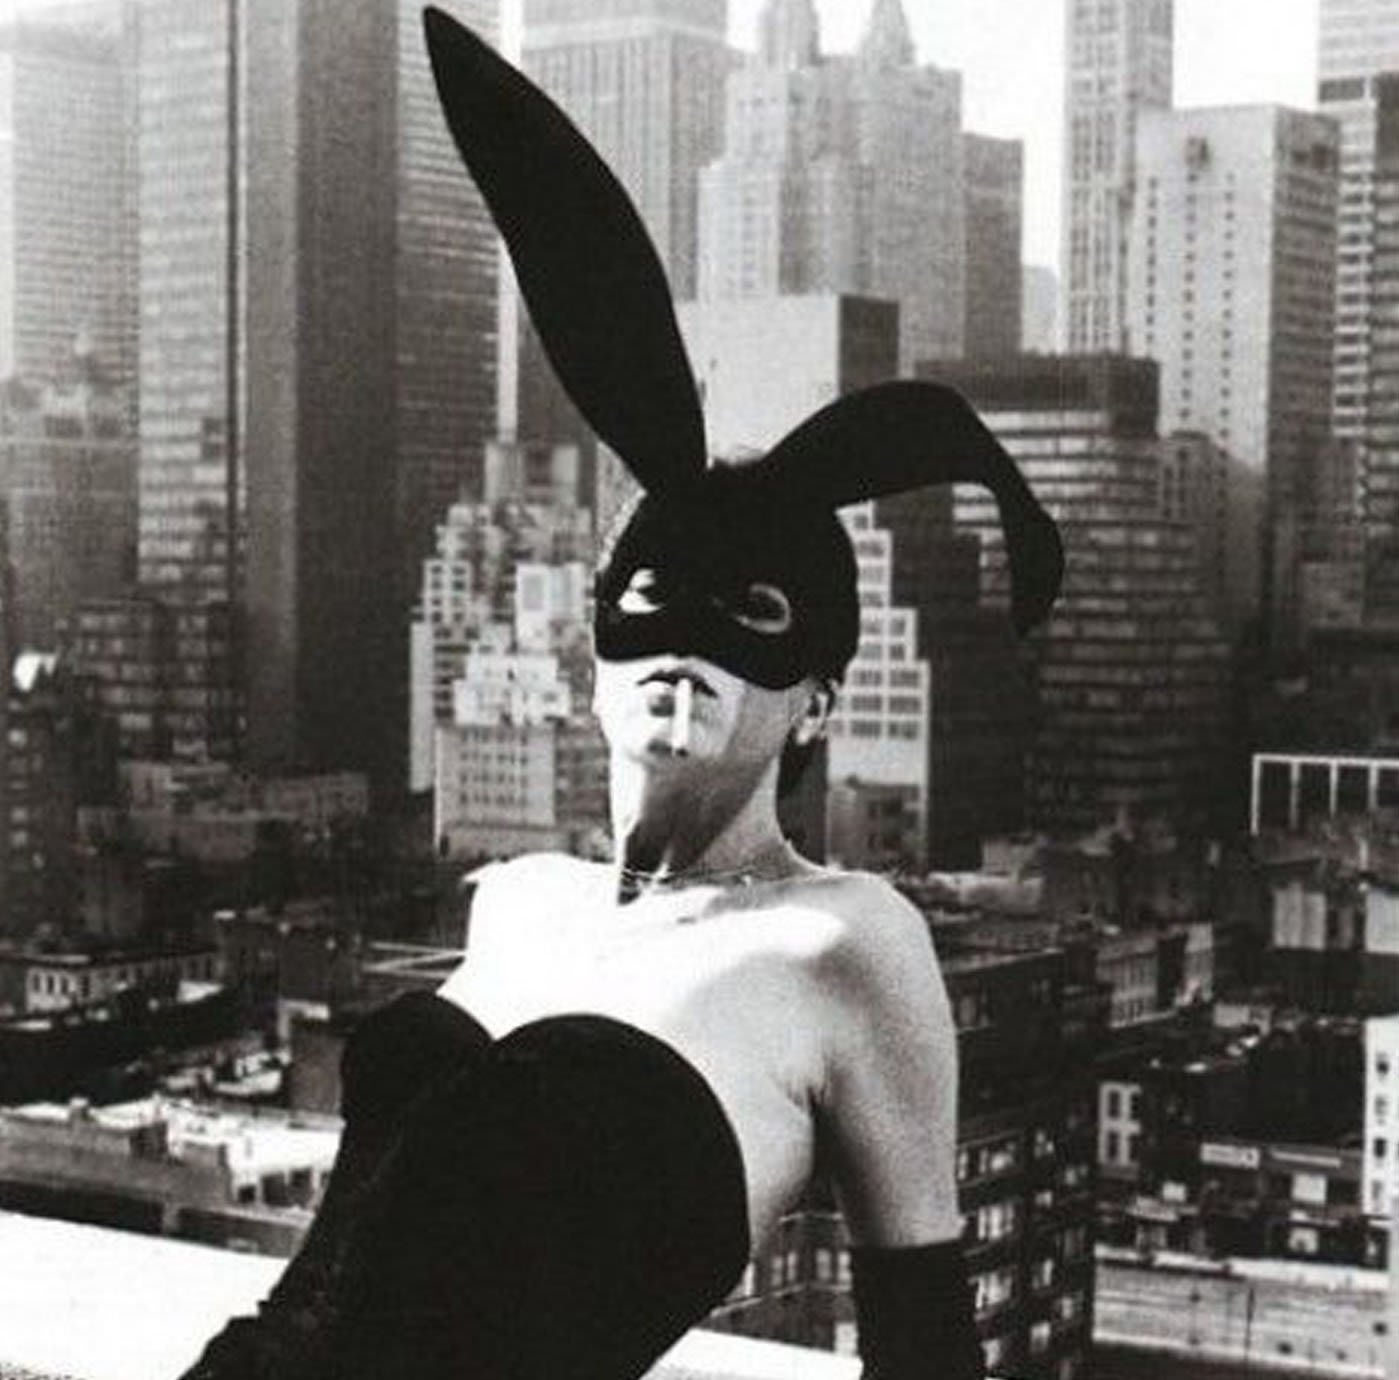 HELMUT NEWTON, Elsa Peretti in Halston Bunny Costume, New York, 1975